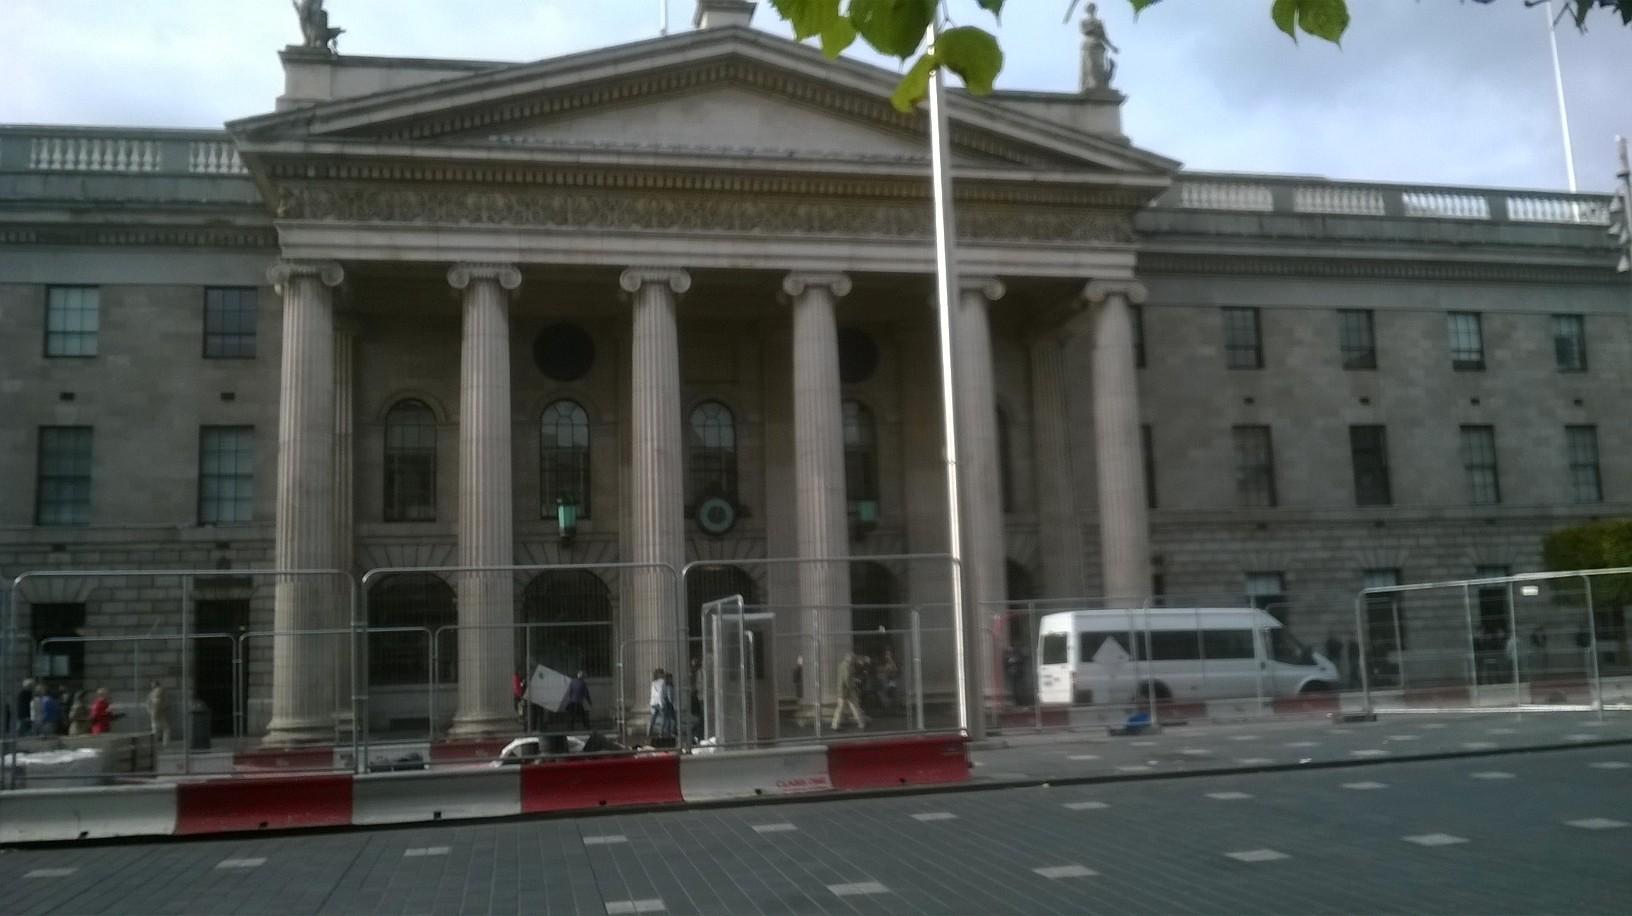 dublin-govt-building-oconnell-st-oct16